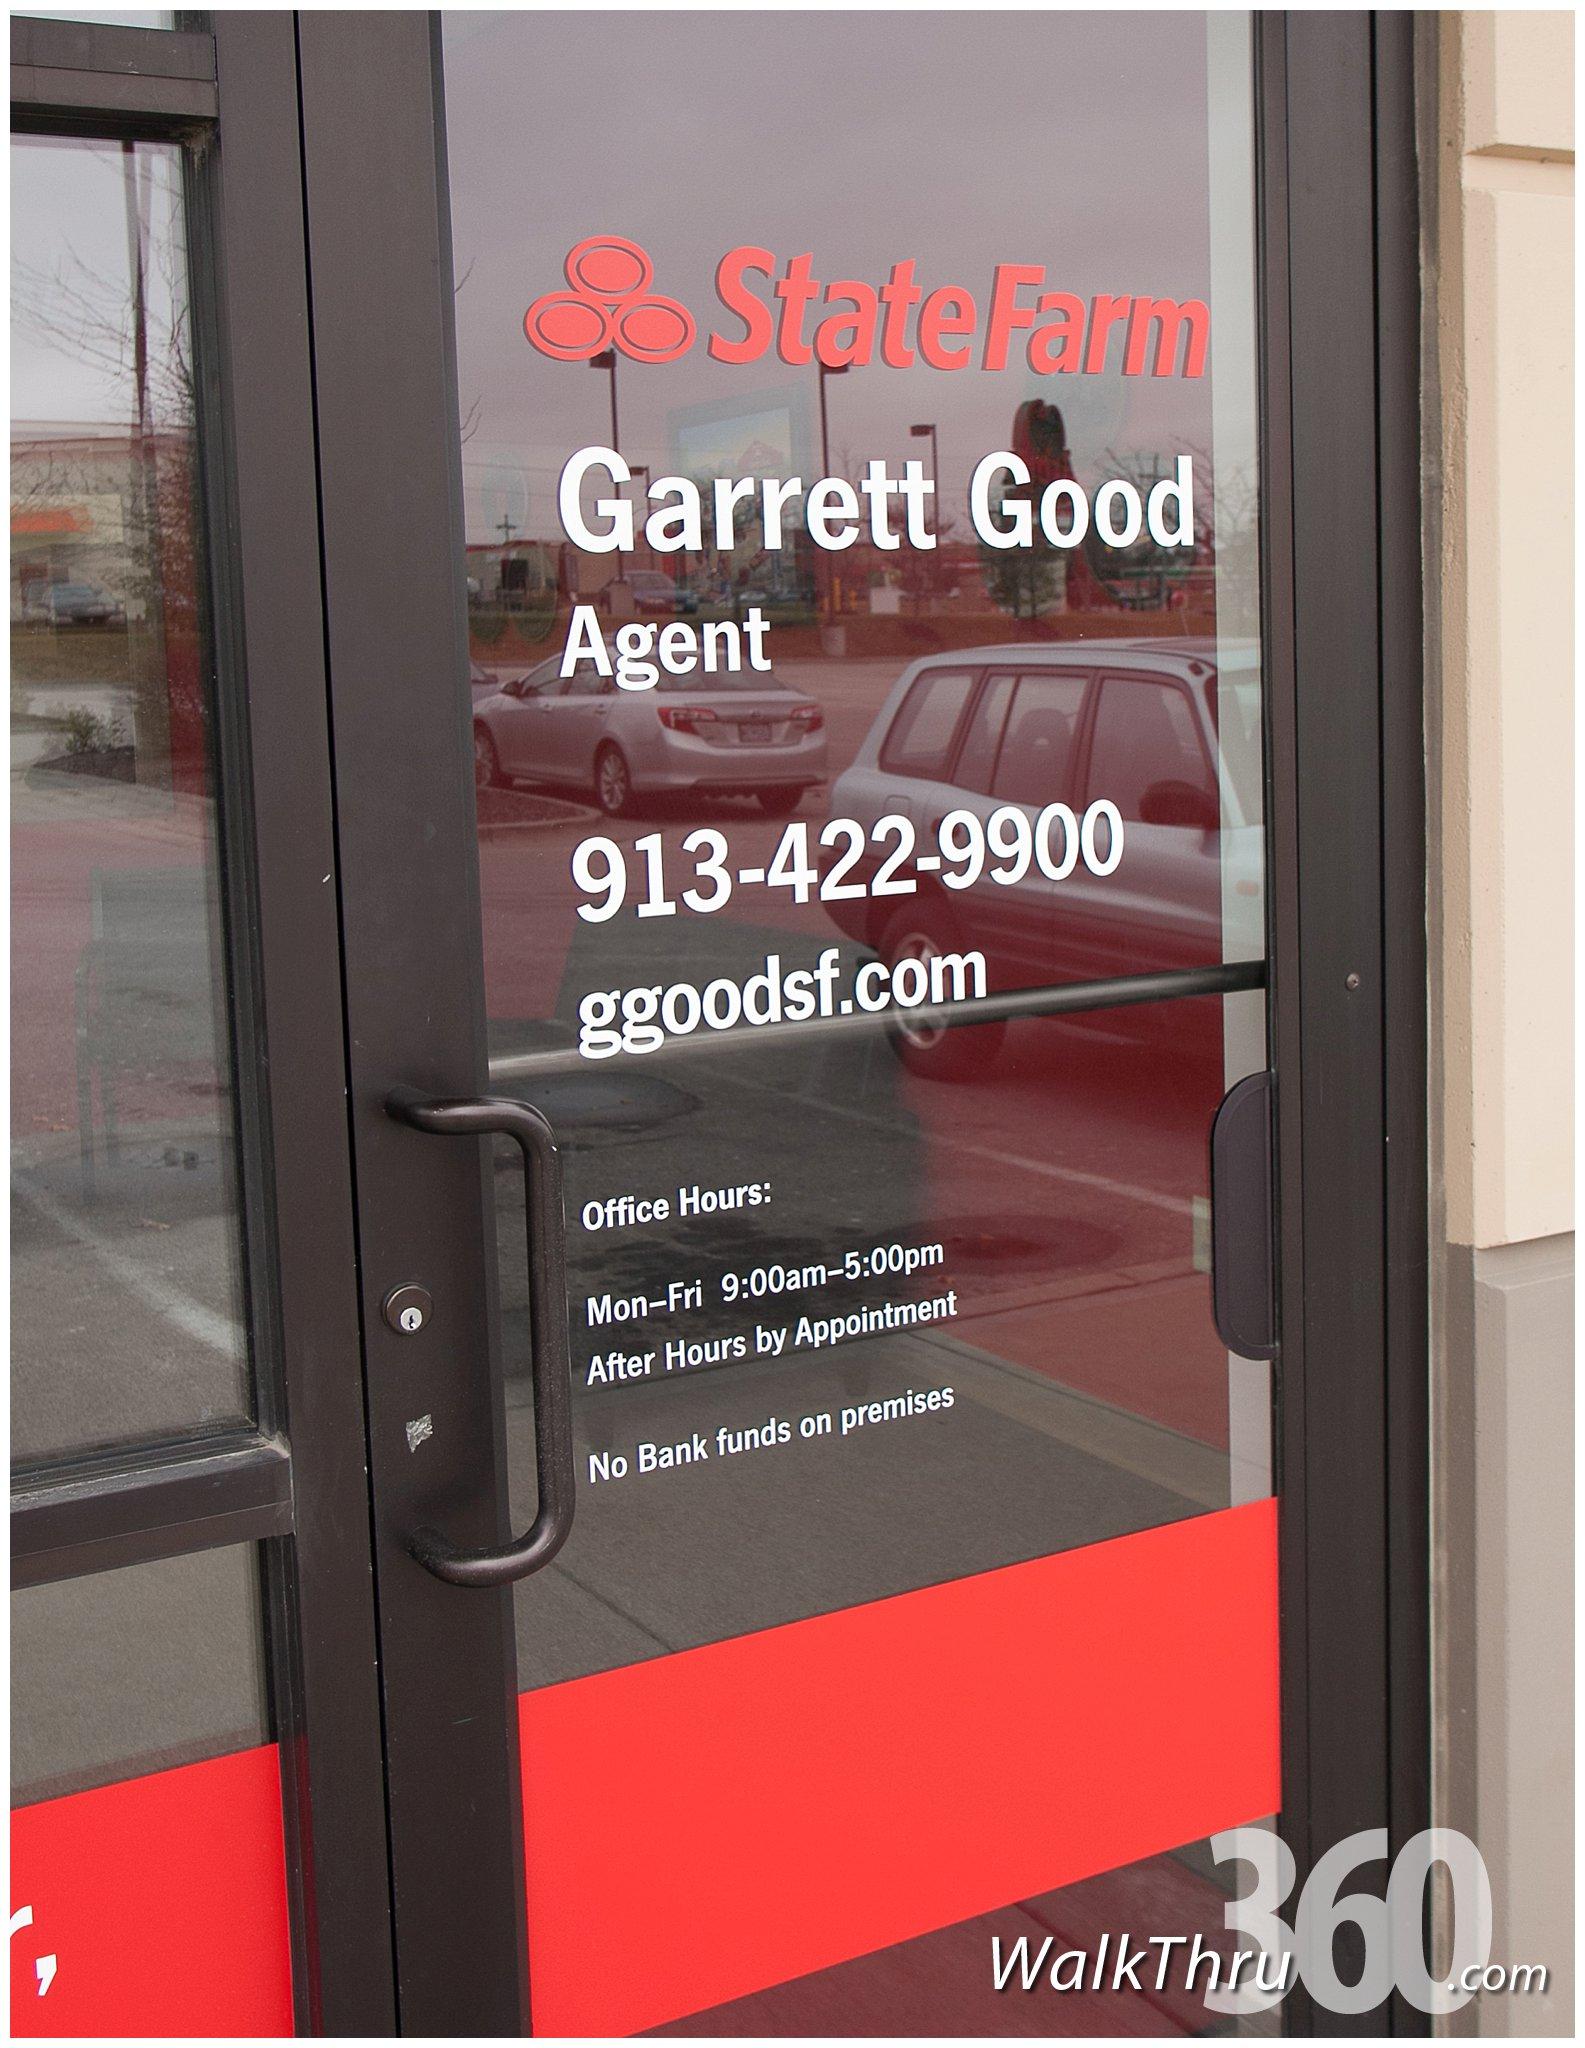 Garrett Good State Farm Insurance Google Virtual Tour For Street